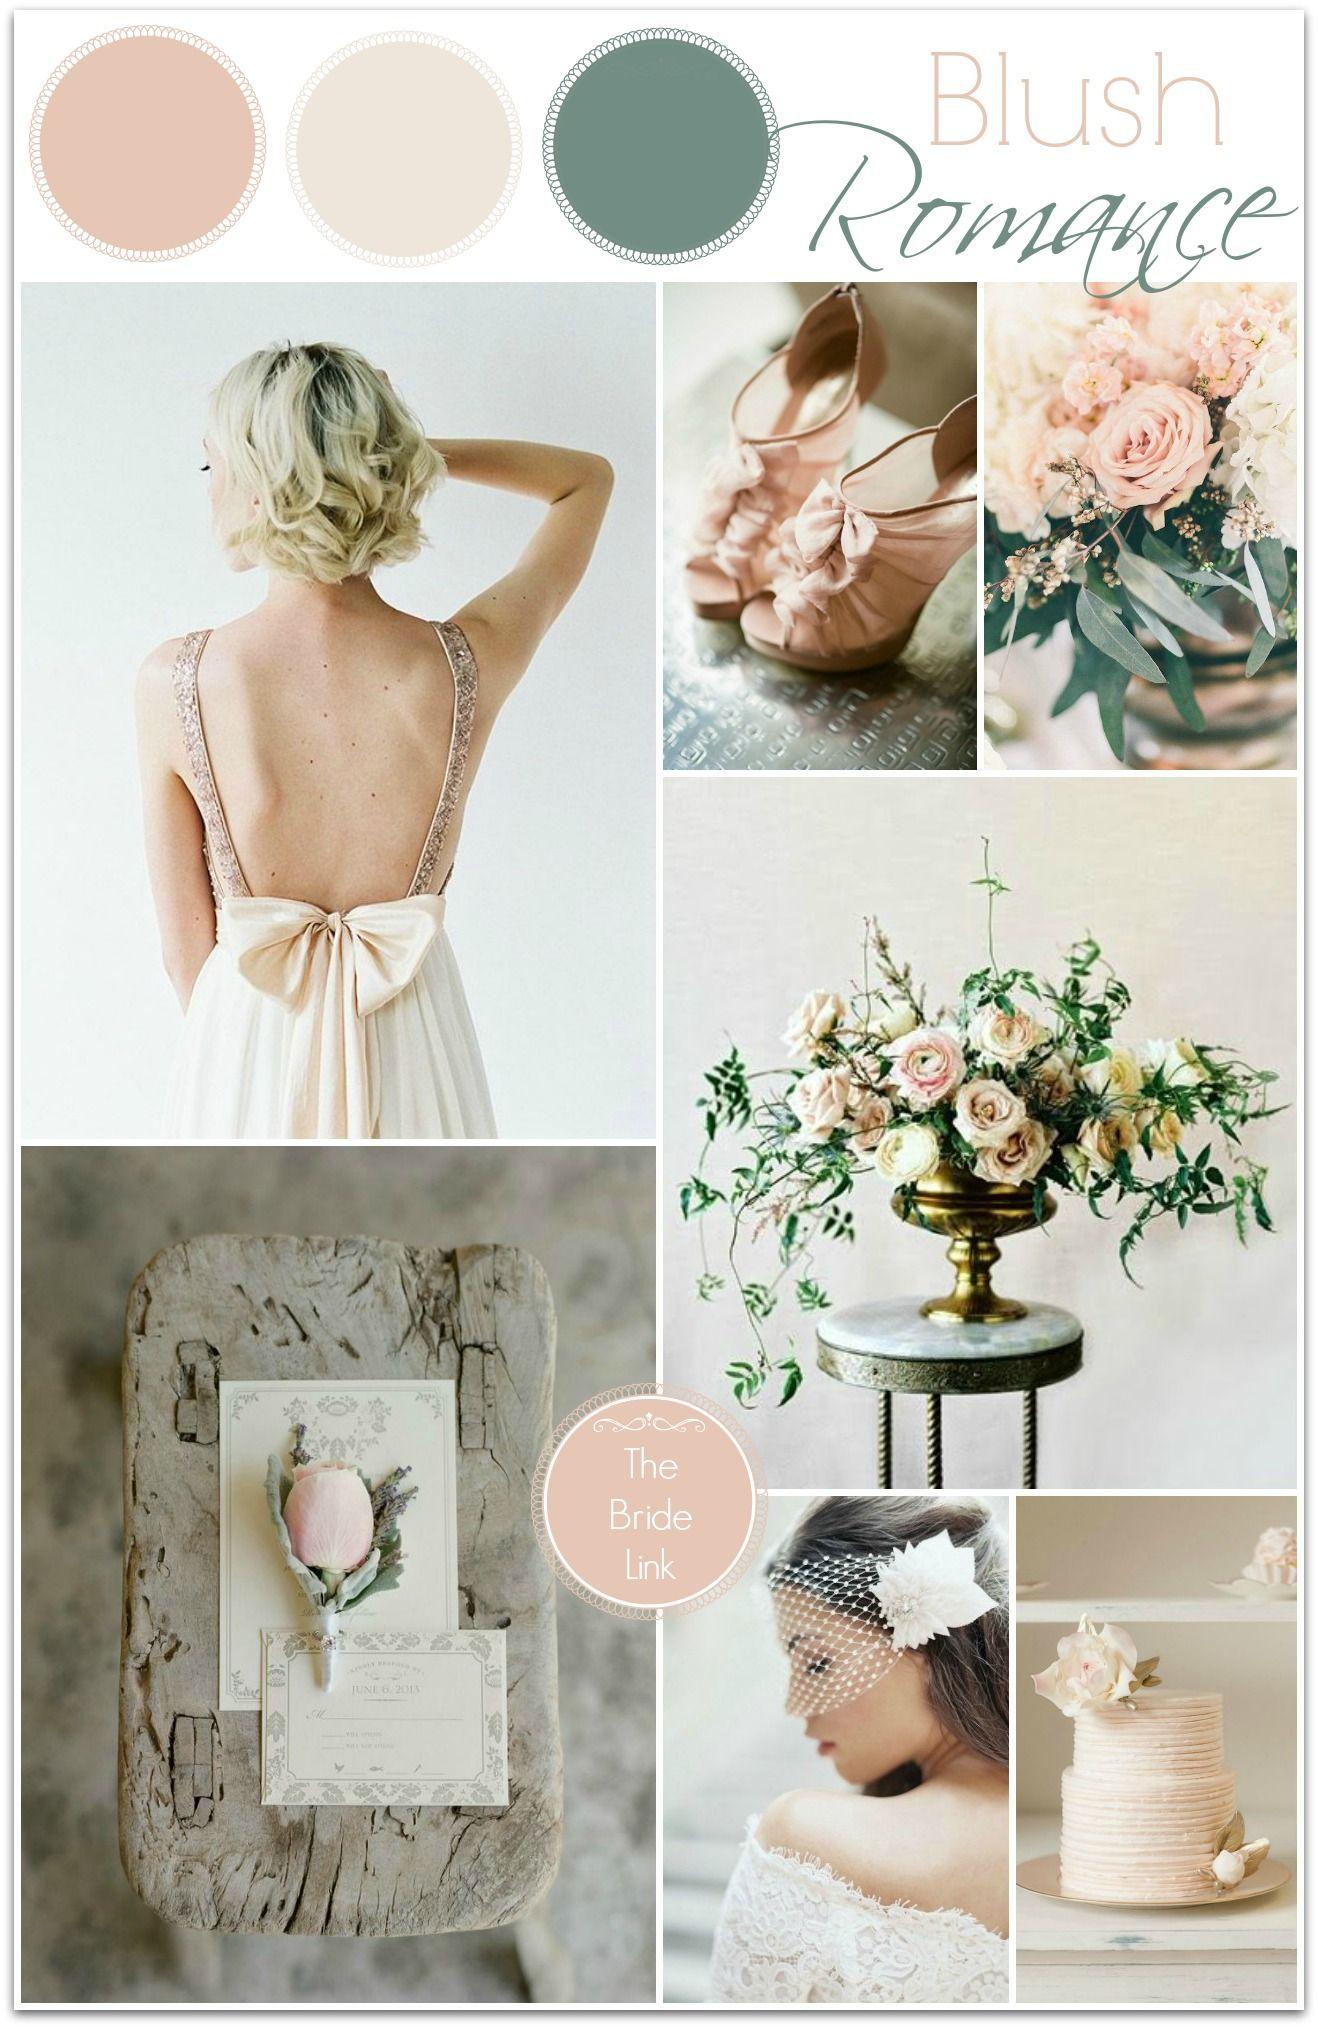 Blush Wedding Ideas | Blush wedding dresses, Neutral color palettes ...